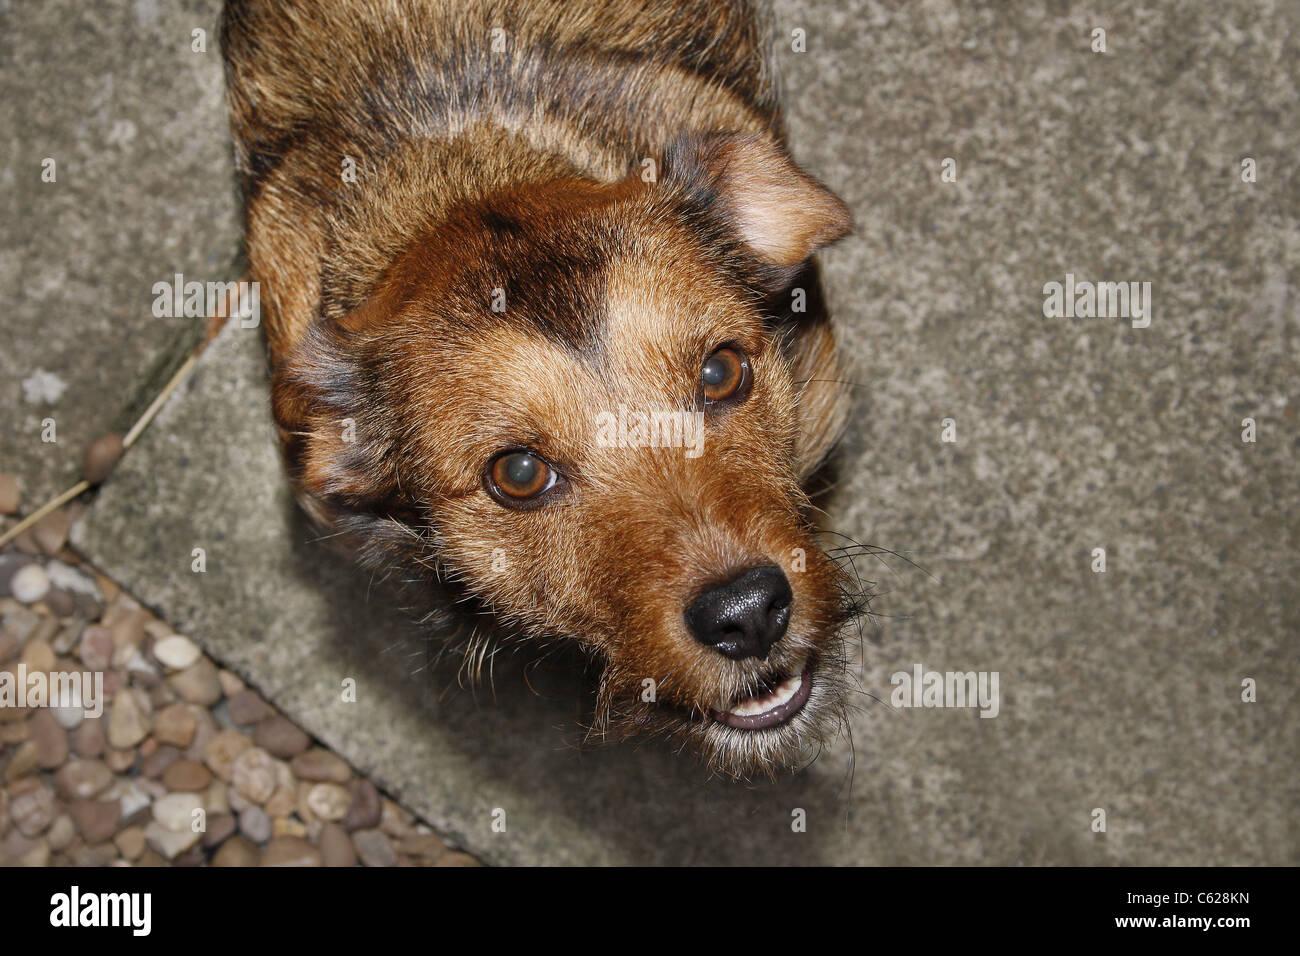 dog barking at camera Canis lupus familiaris - Stock Image